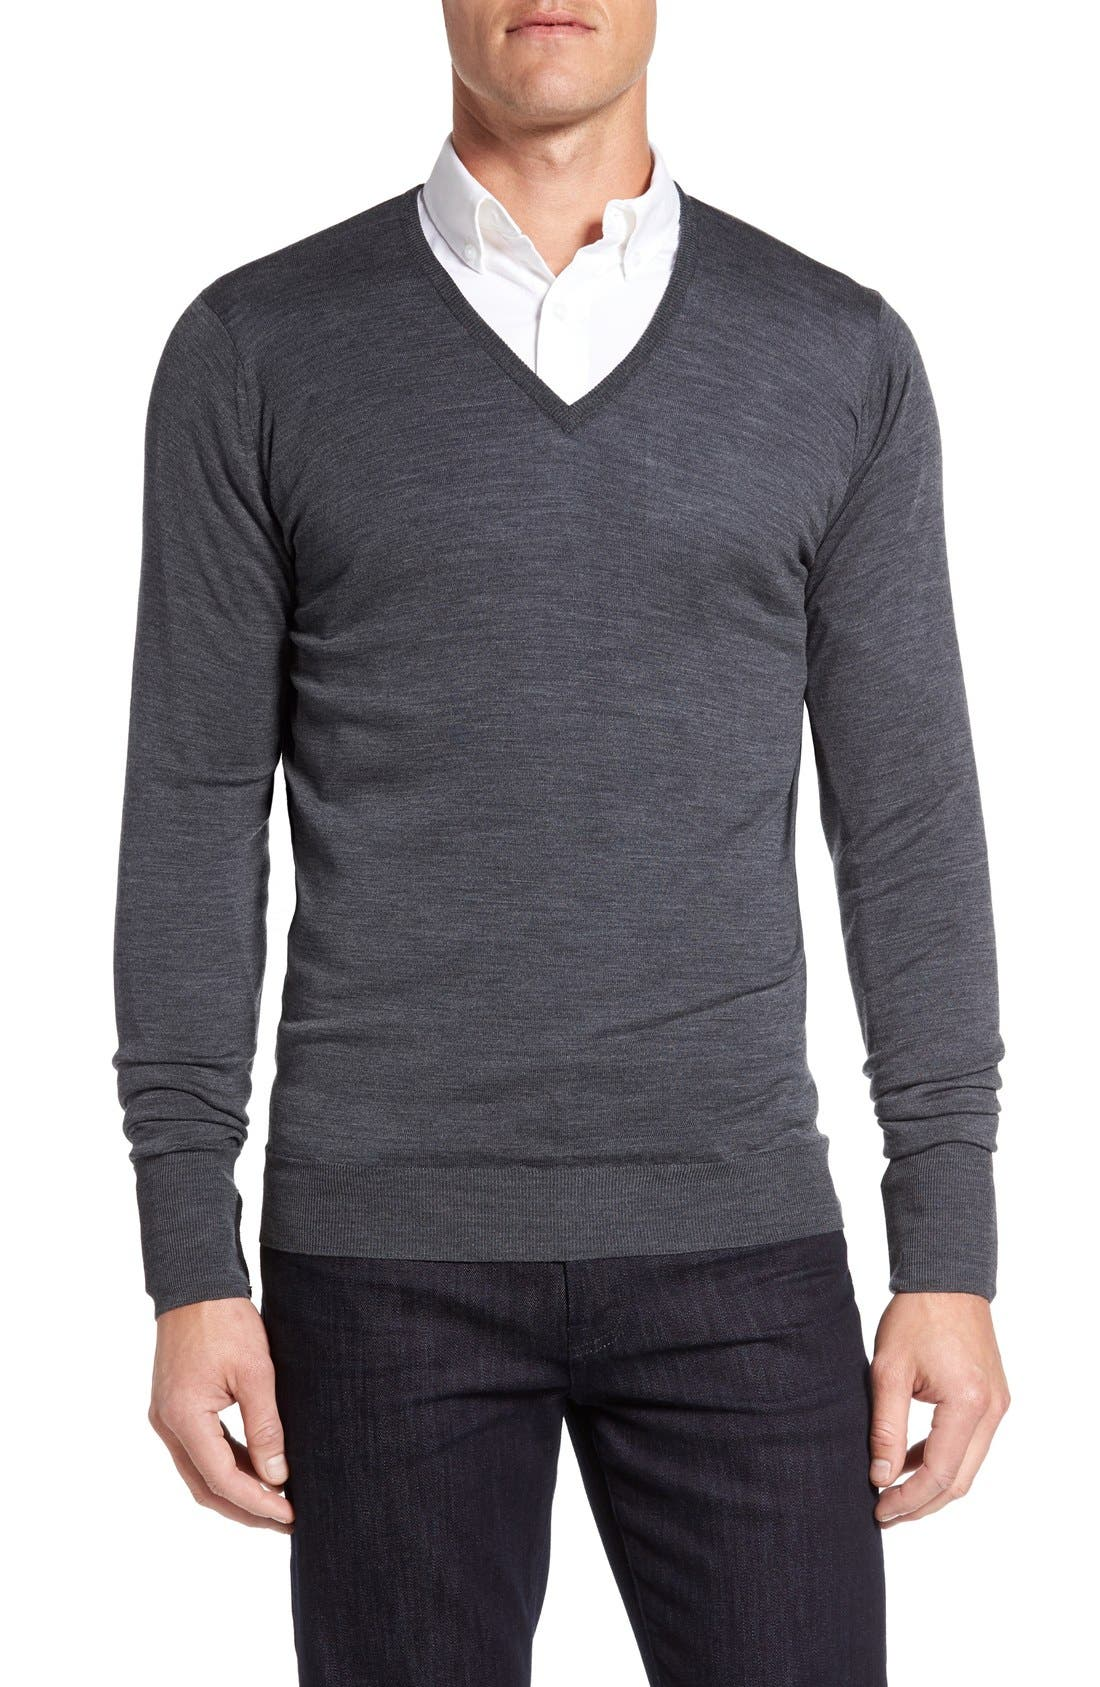 Main Image - John Smedley 'Bobby' Easy Fit V Neck Wool Sweater